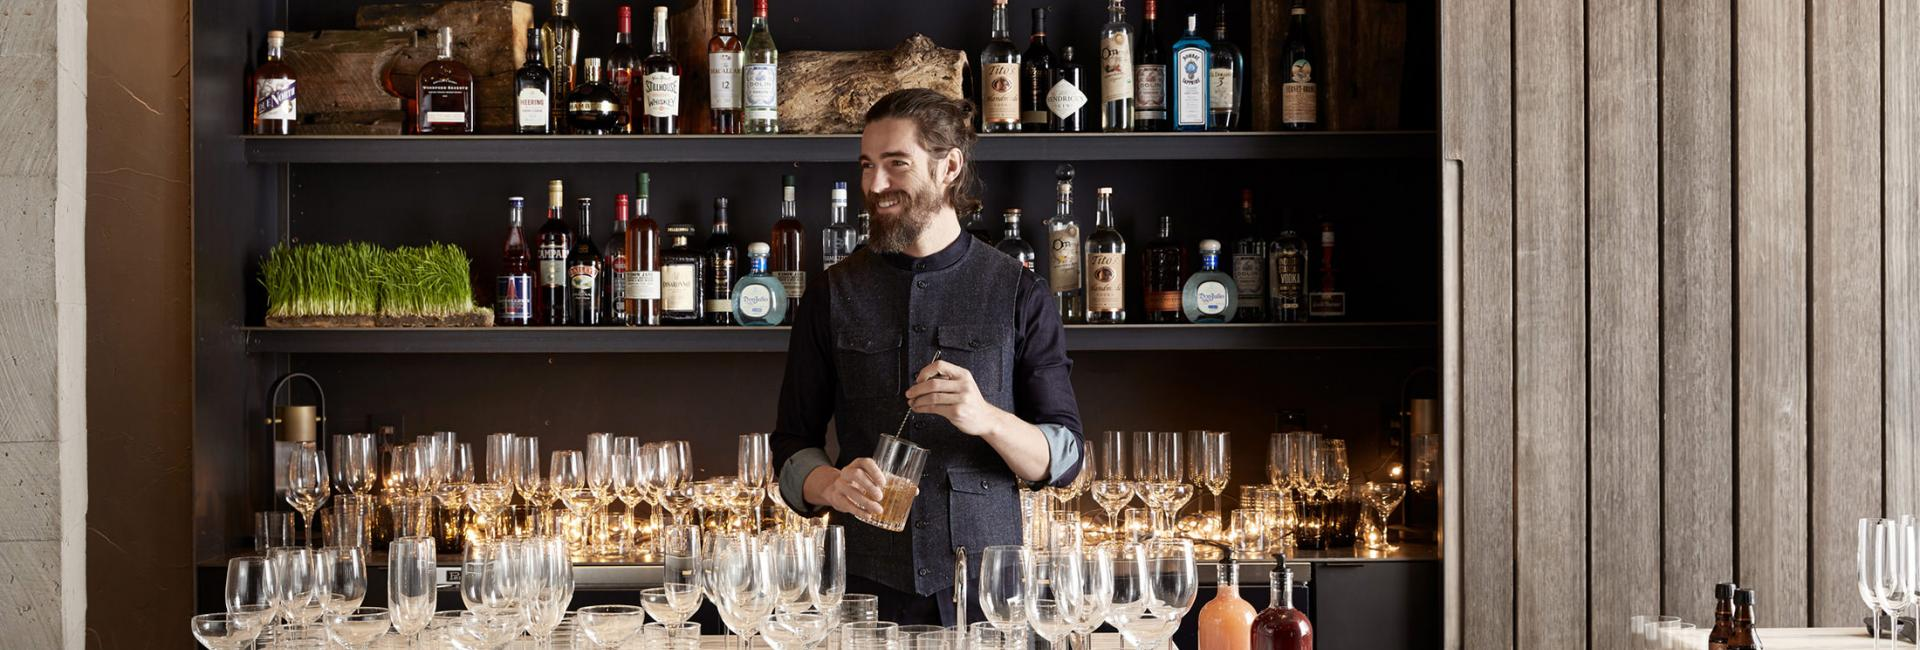 Bartender making cocktail in front of fancy bar